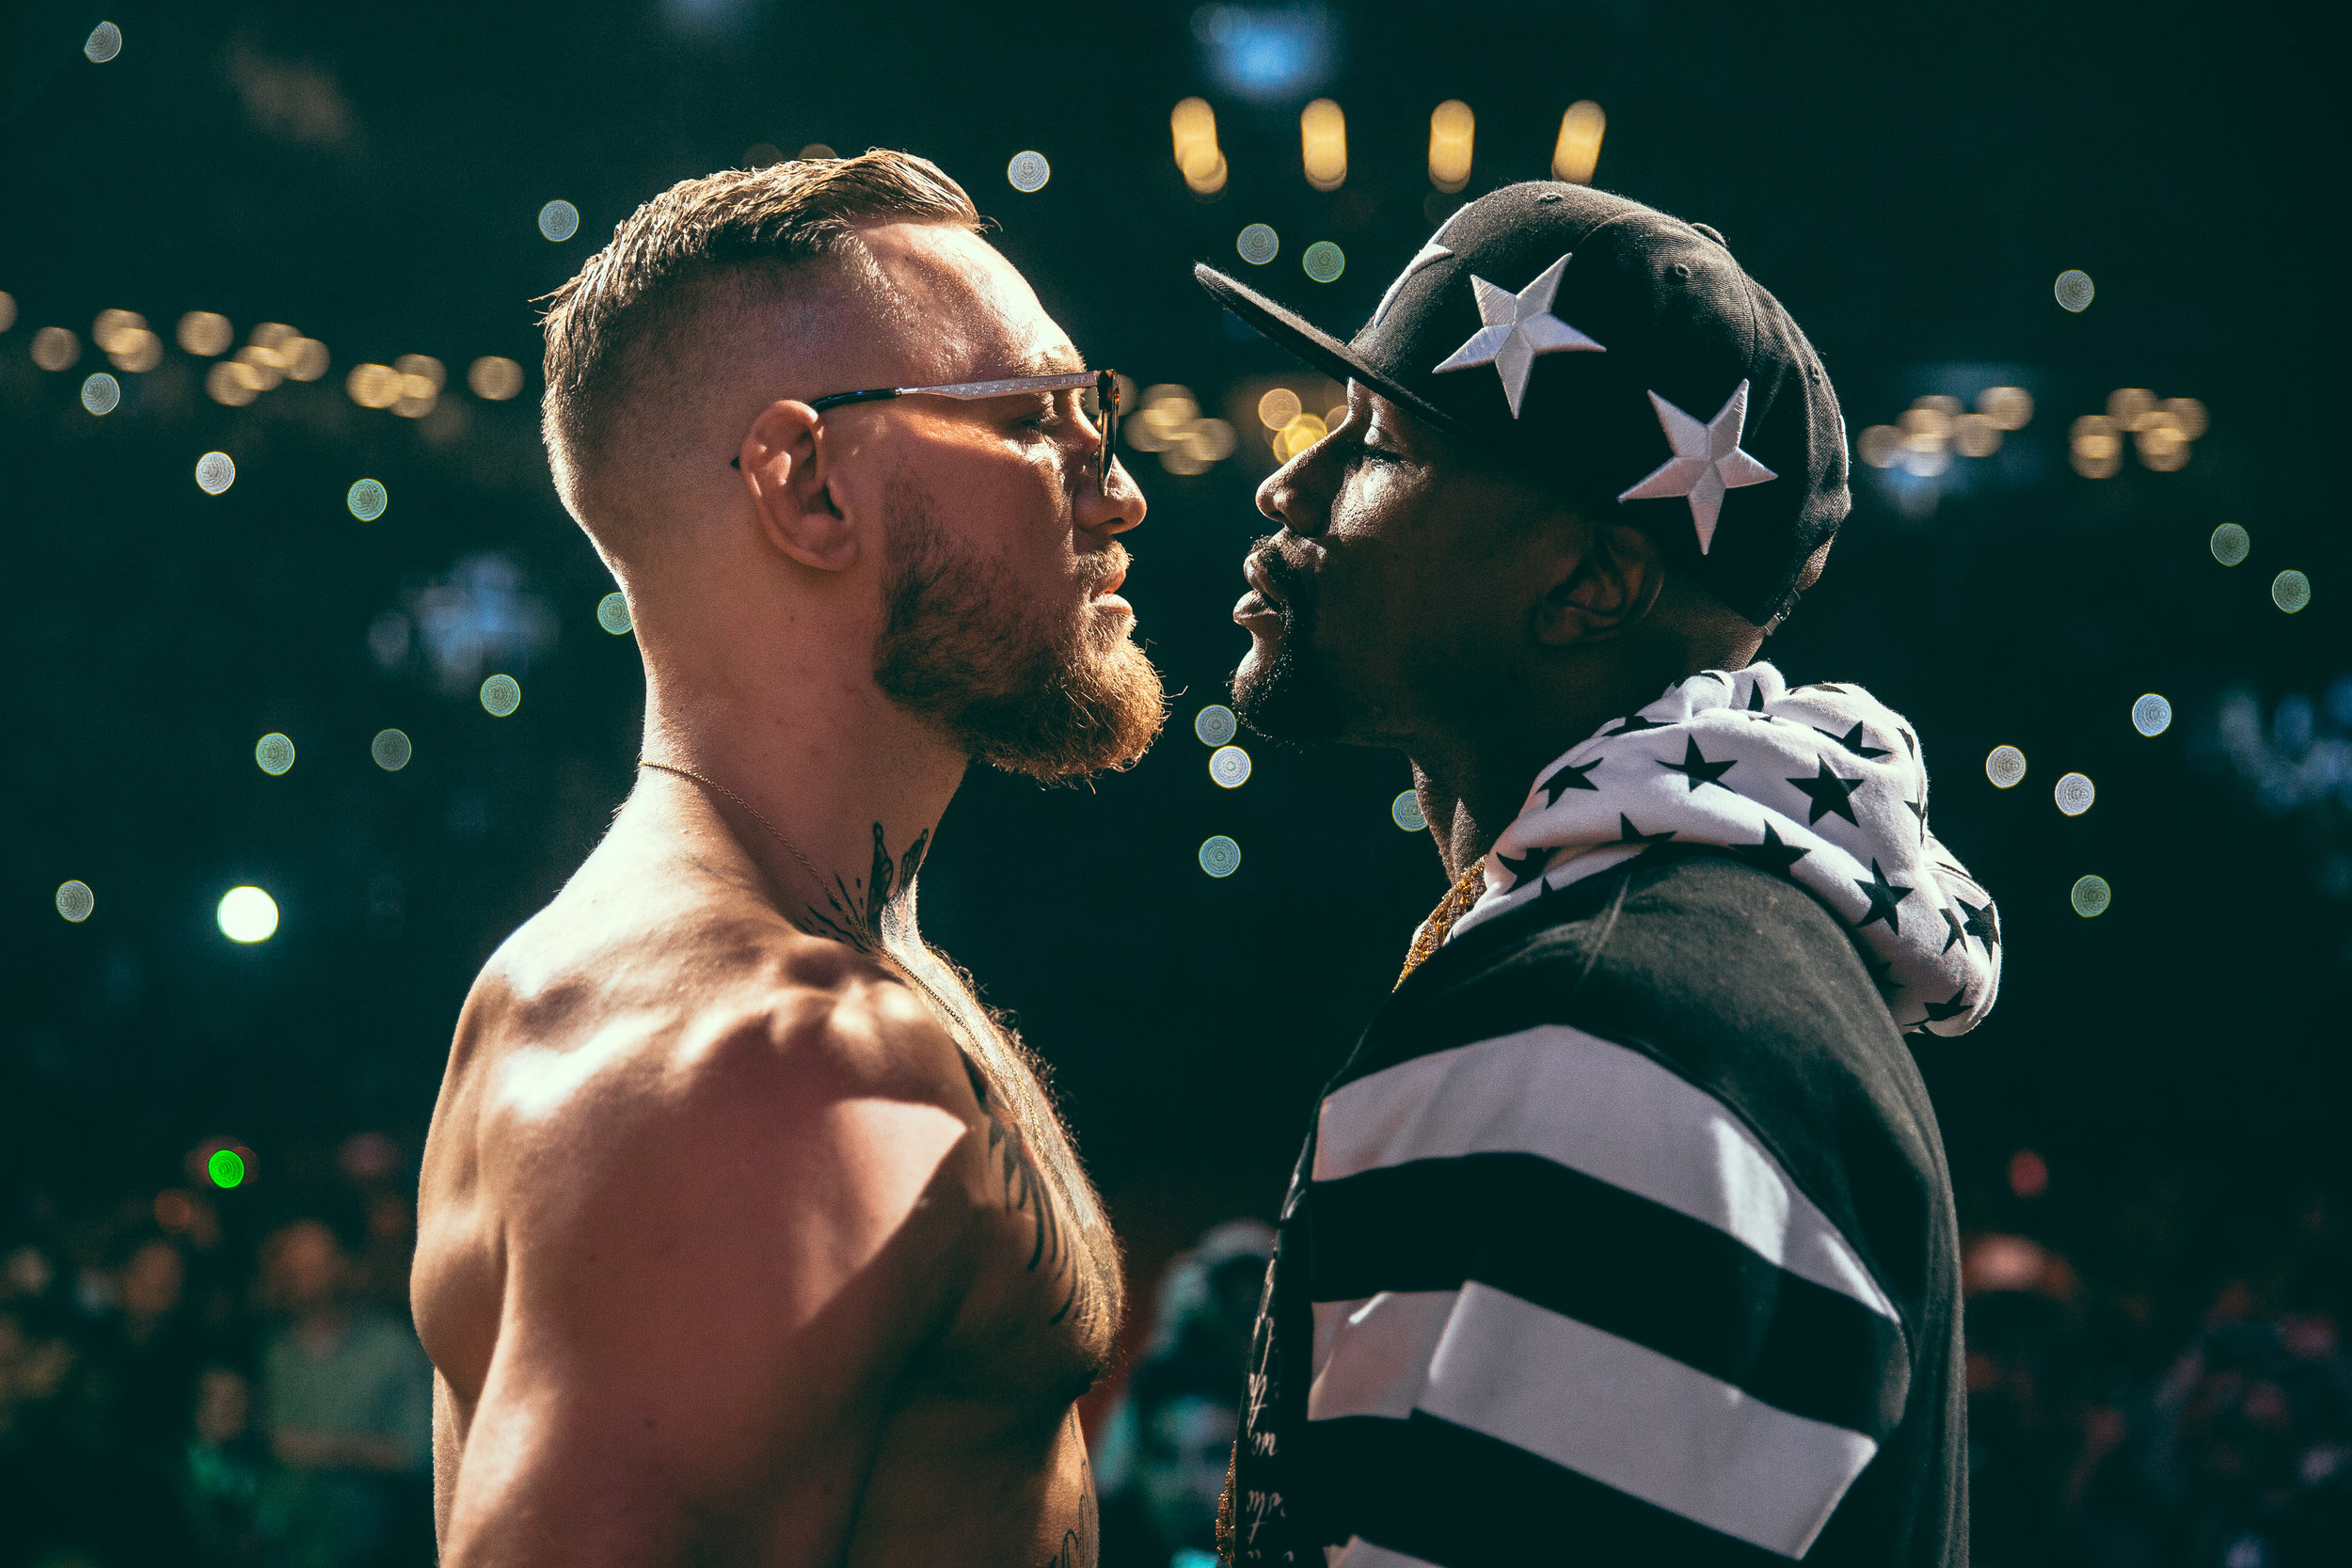 37_Mayweather_vs_McGregor_WorldTour_NY.jpg